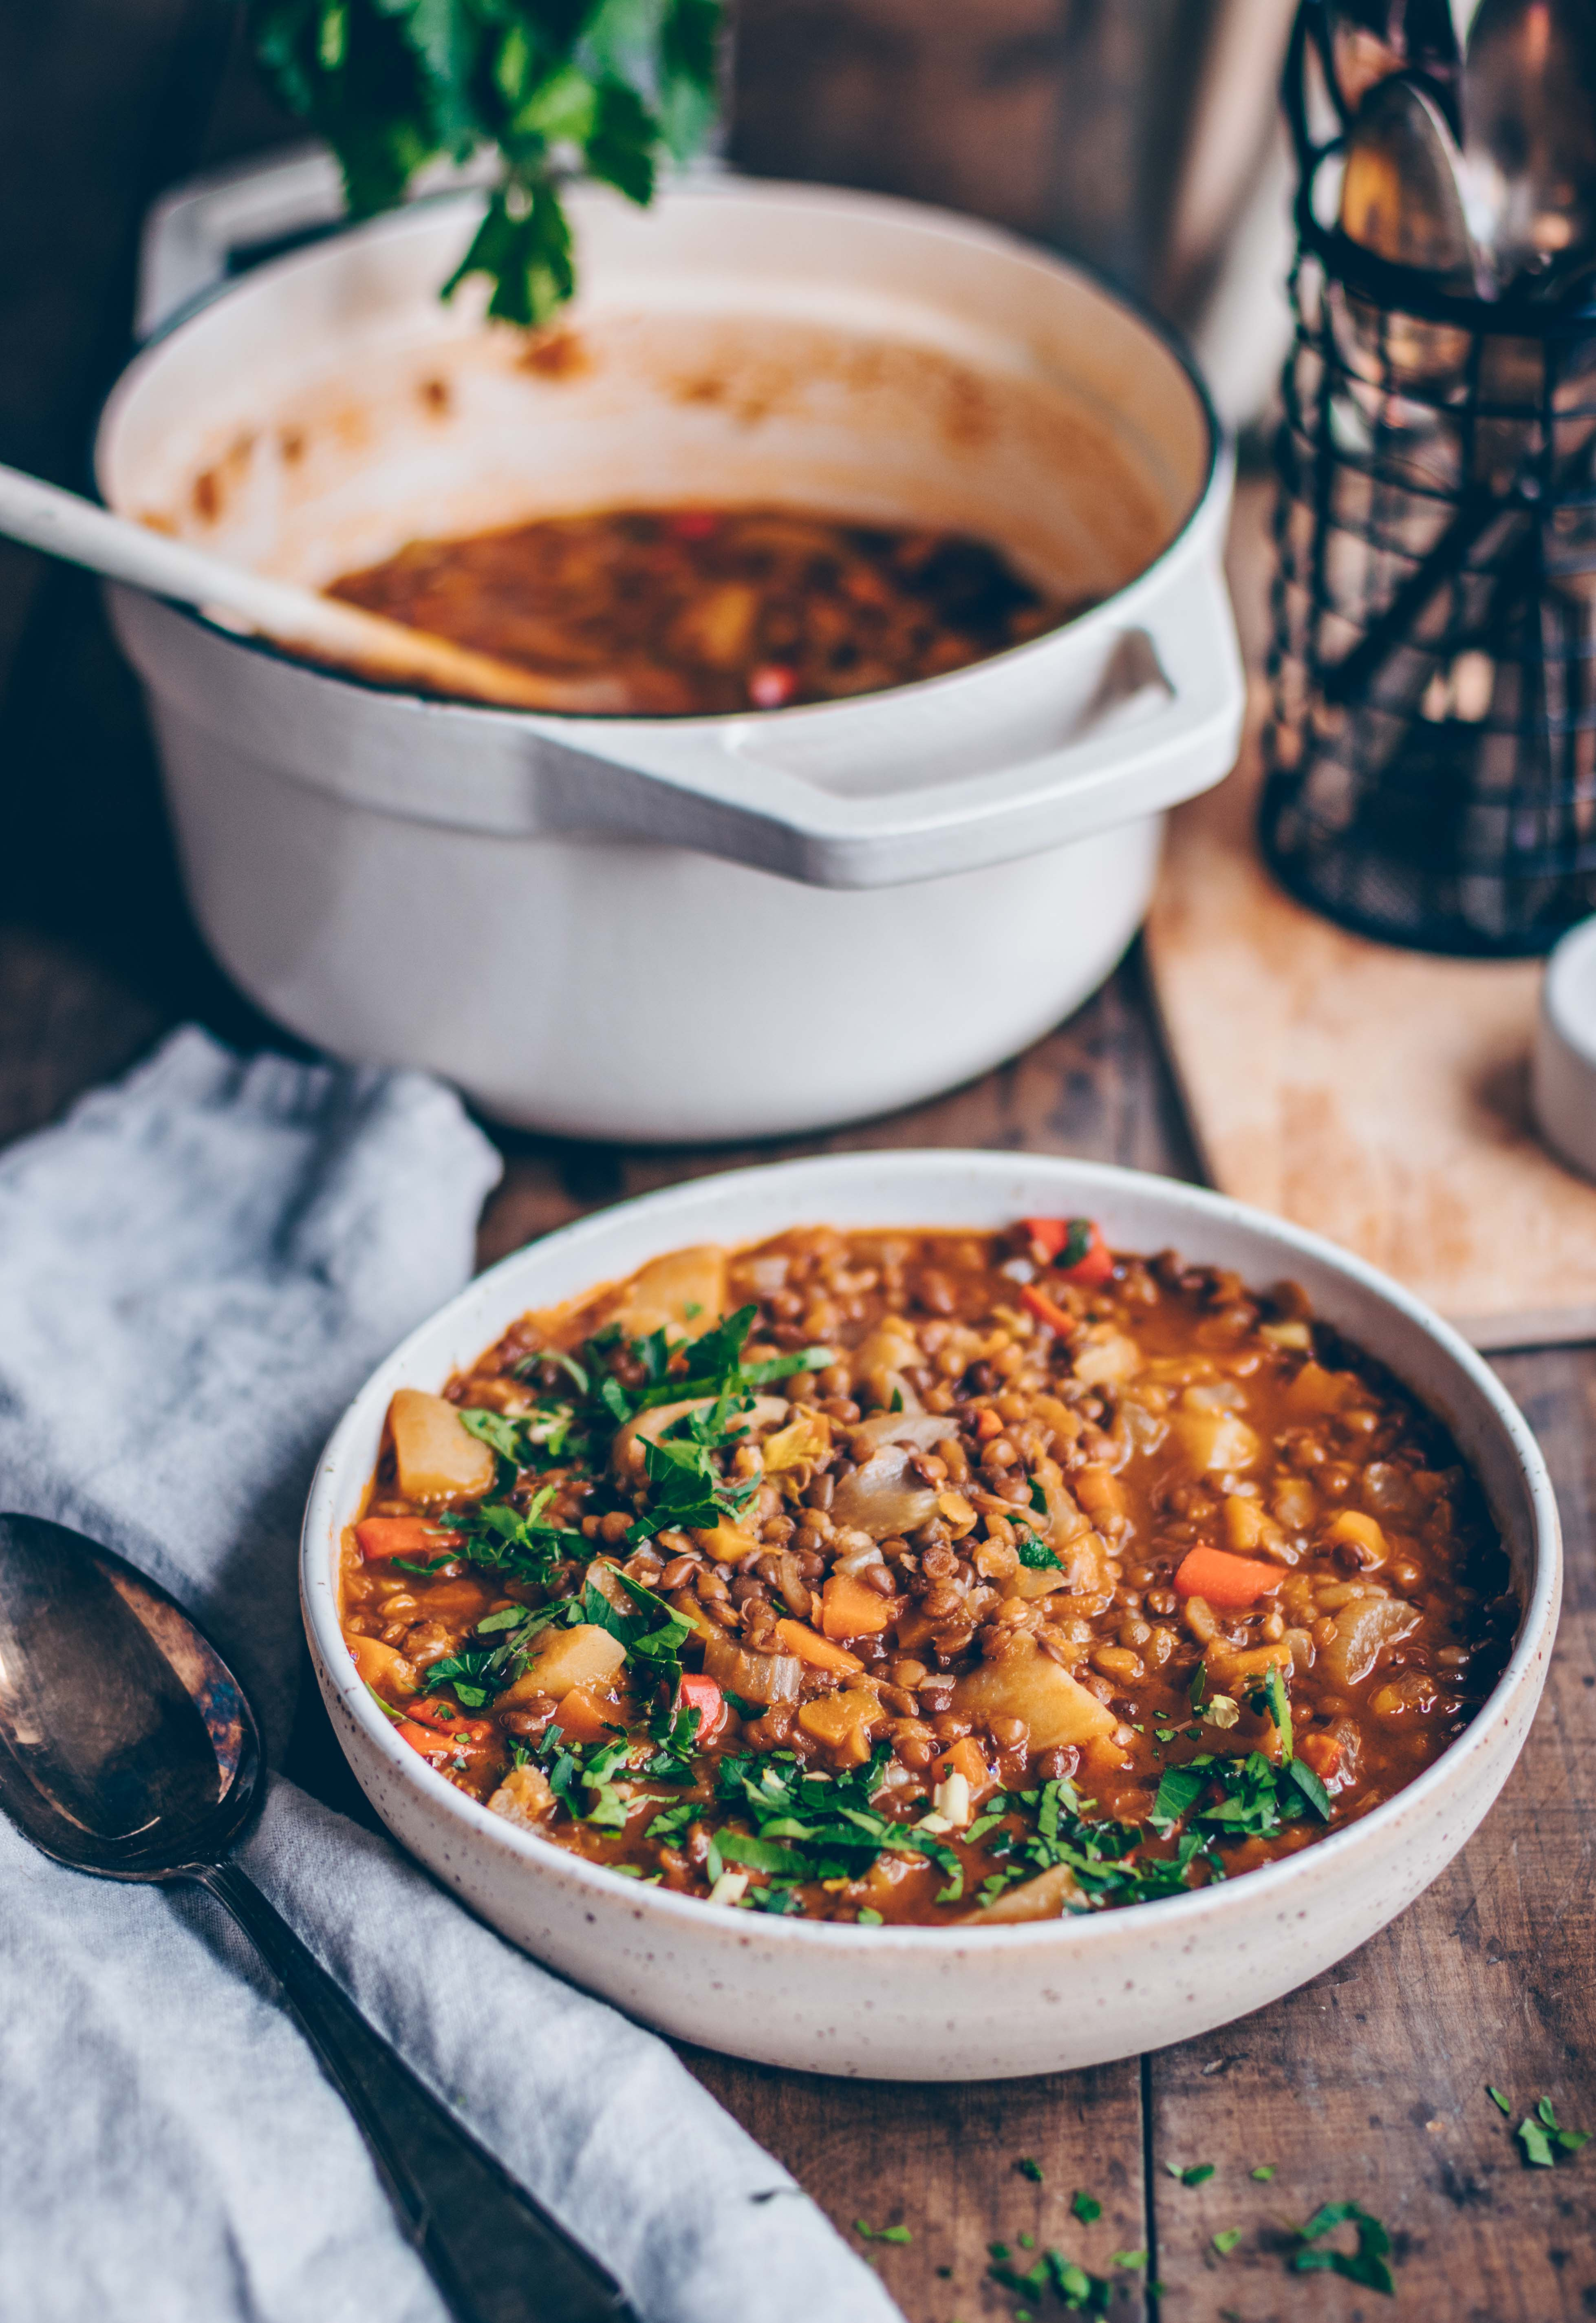 Lentil and vegetable stew